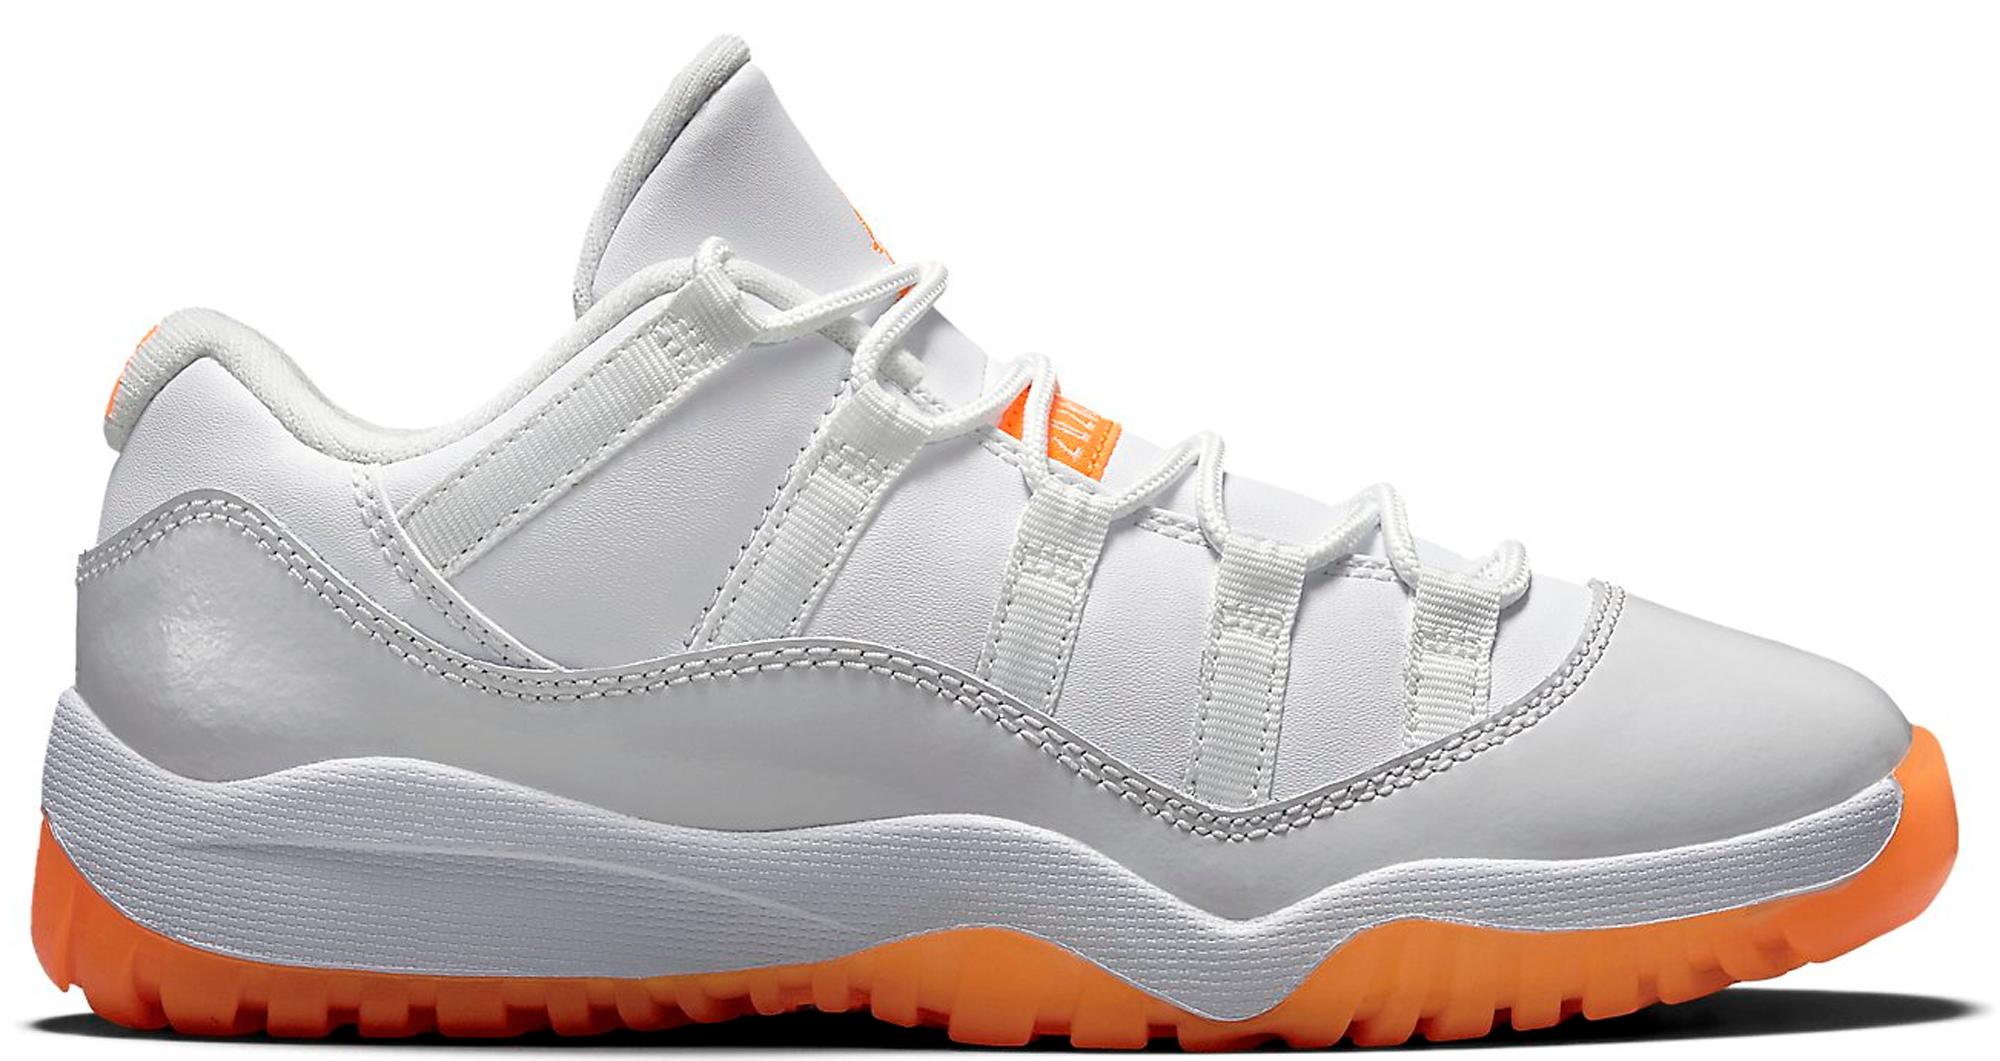 Jordan 11 Retro Low Citrus 2015 (PS